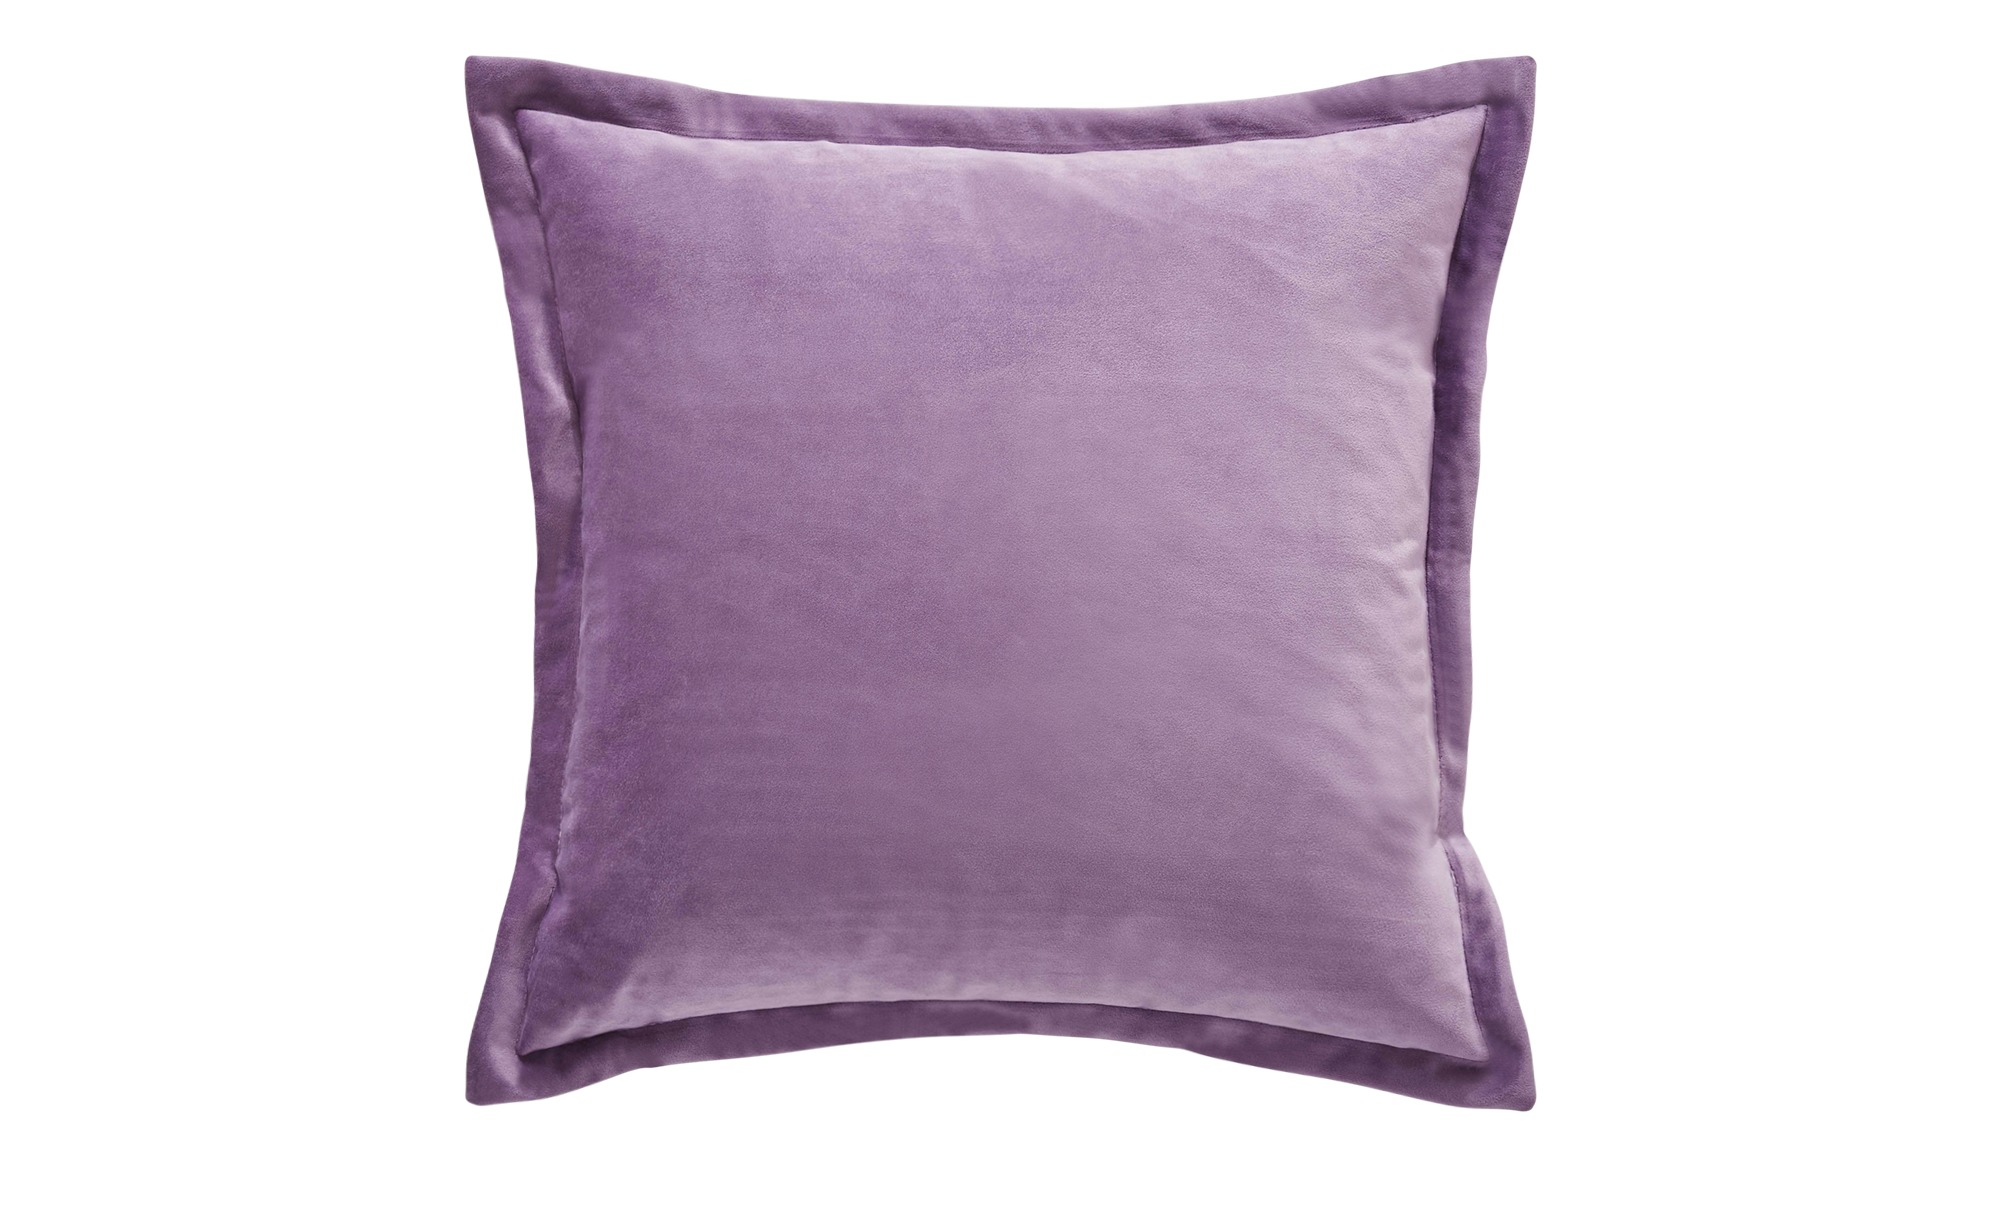 HOME STORY Kissen  Charlotte ¦ lila/violett ¦ Maße (cm): B: 45 H: 2,5 T: 2,5 Heimtextilien > Kissen > Dekokissen - Höffner